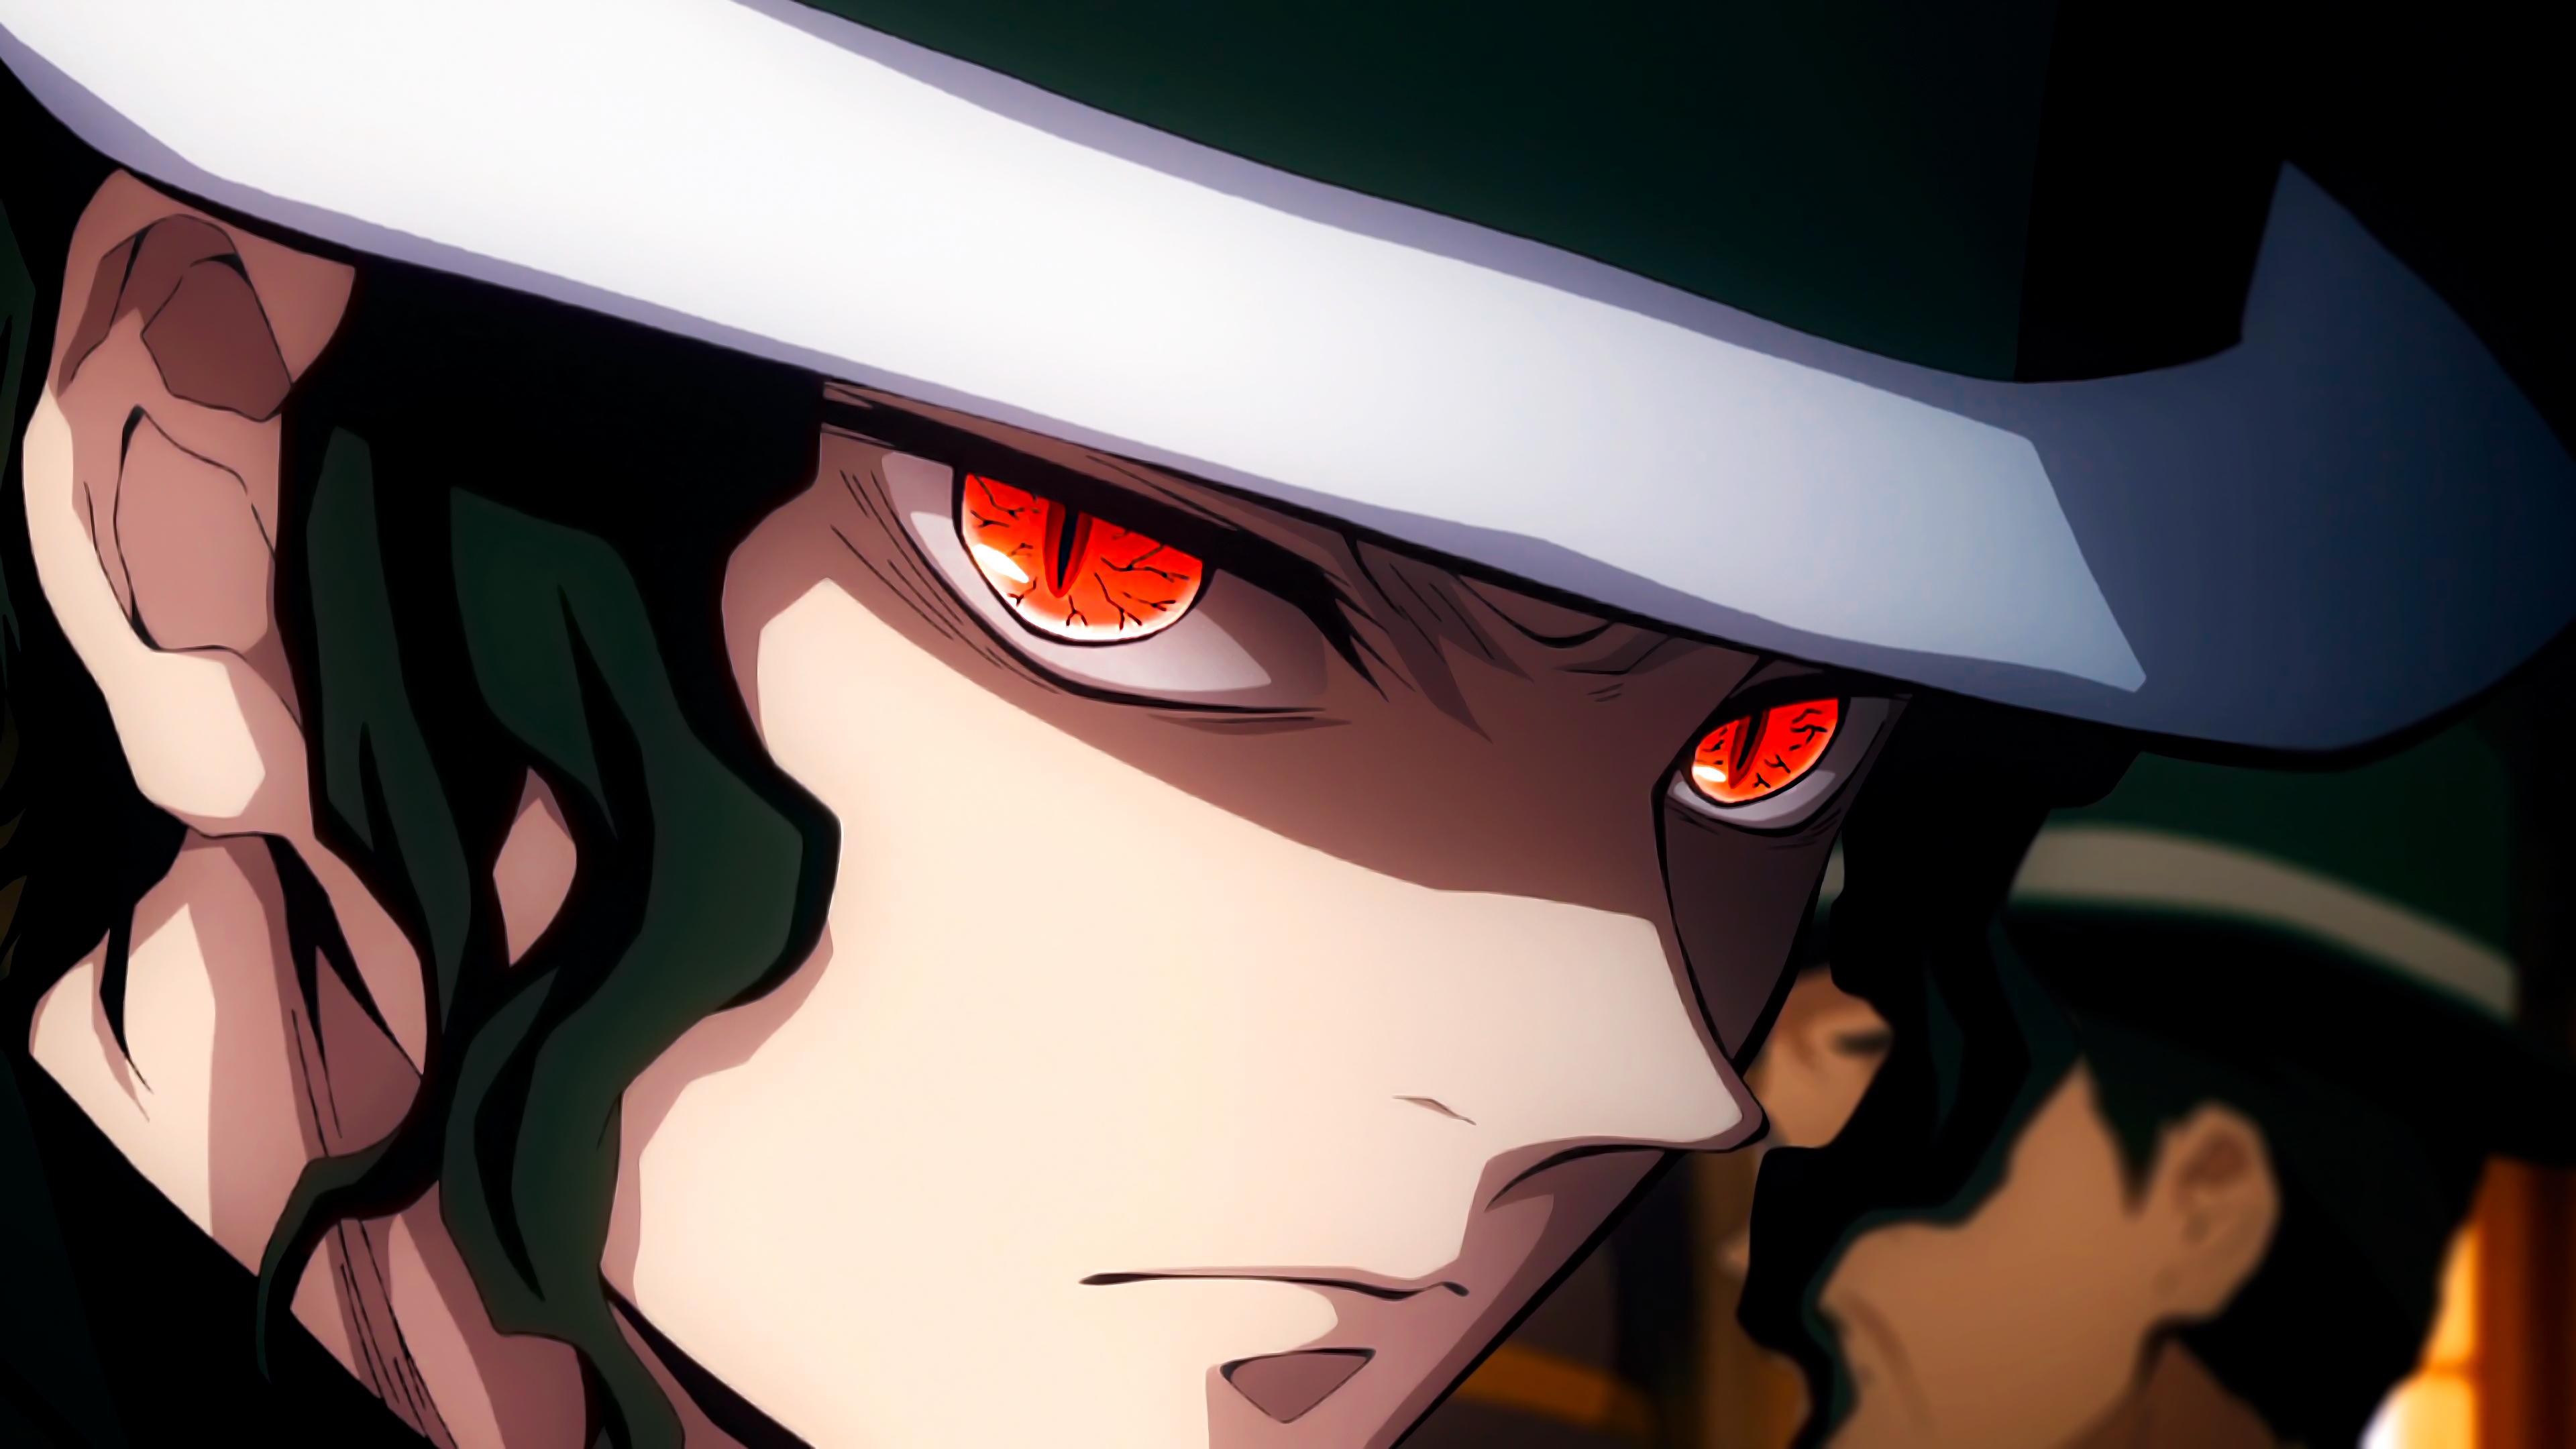 Anime 3840x2160 Kimetsu no Yaiba anime digital art artwork anime boys Muzan Kibutsuji hat red eyes face